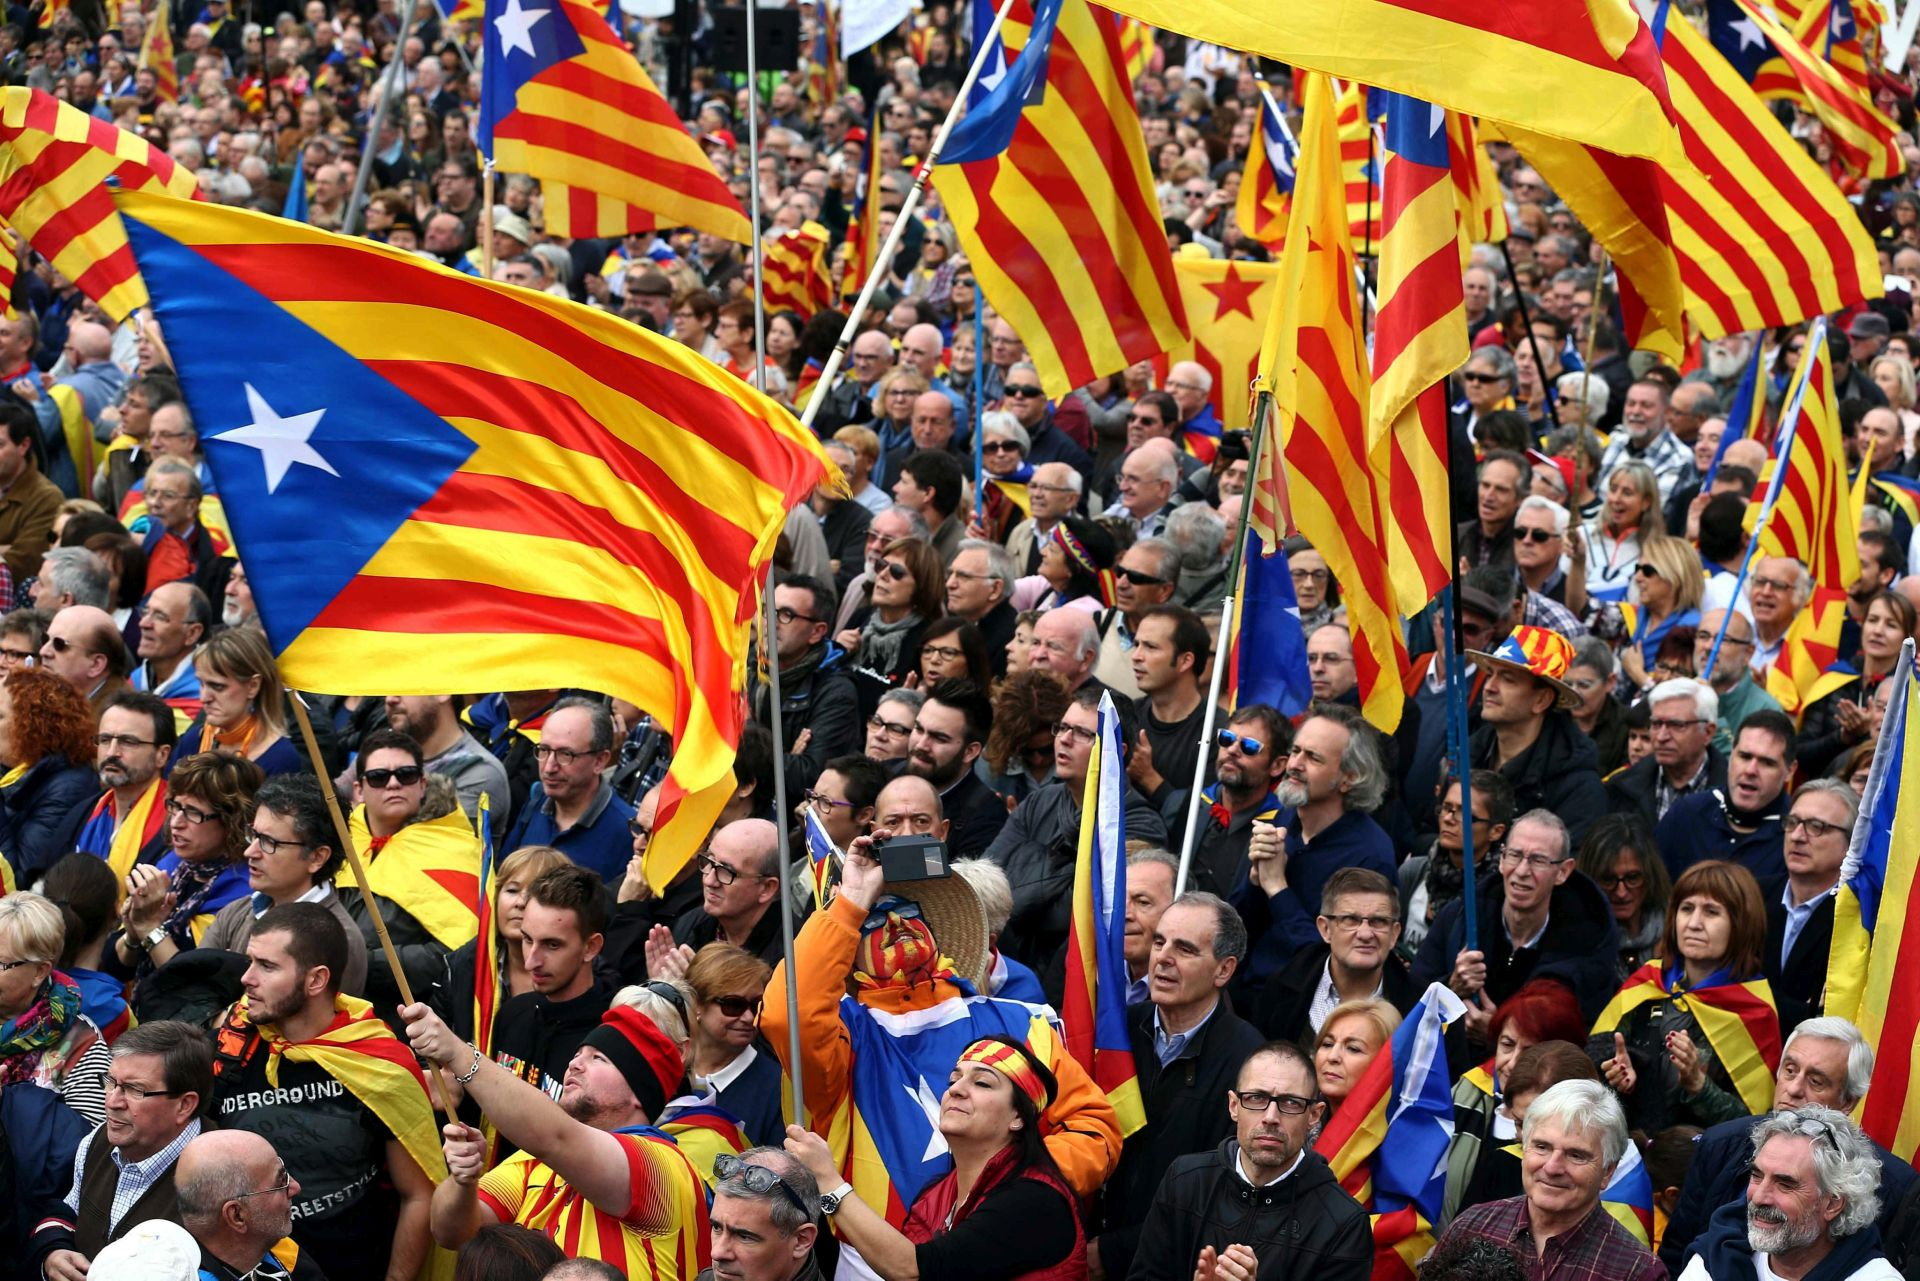 ANKETNA PROGNOZA Katalonski separatisti će tijesno izgubiti većinu na izborima